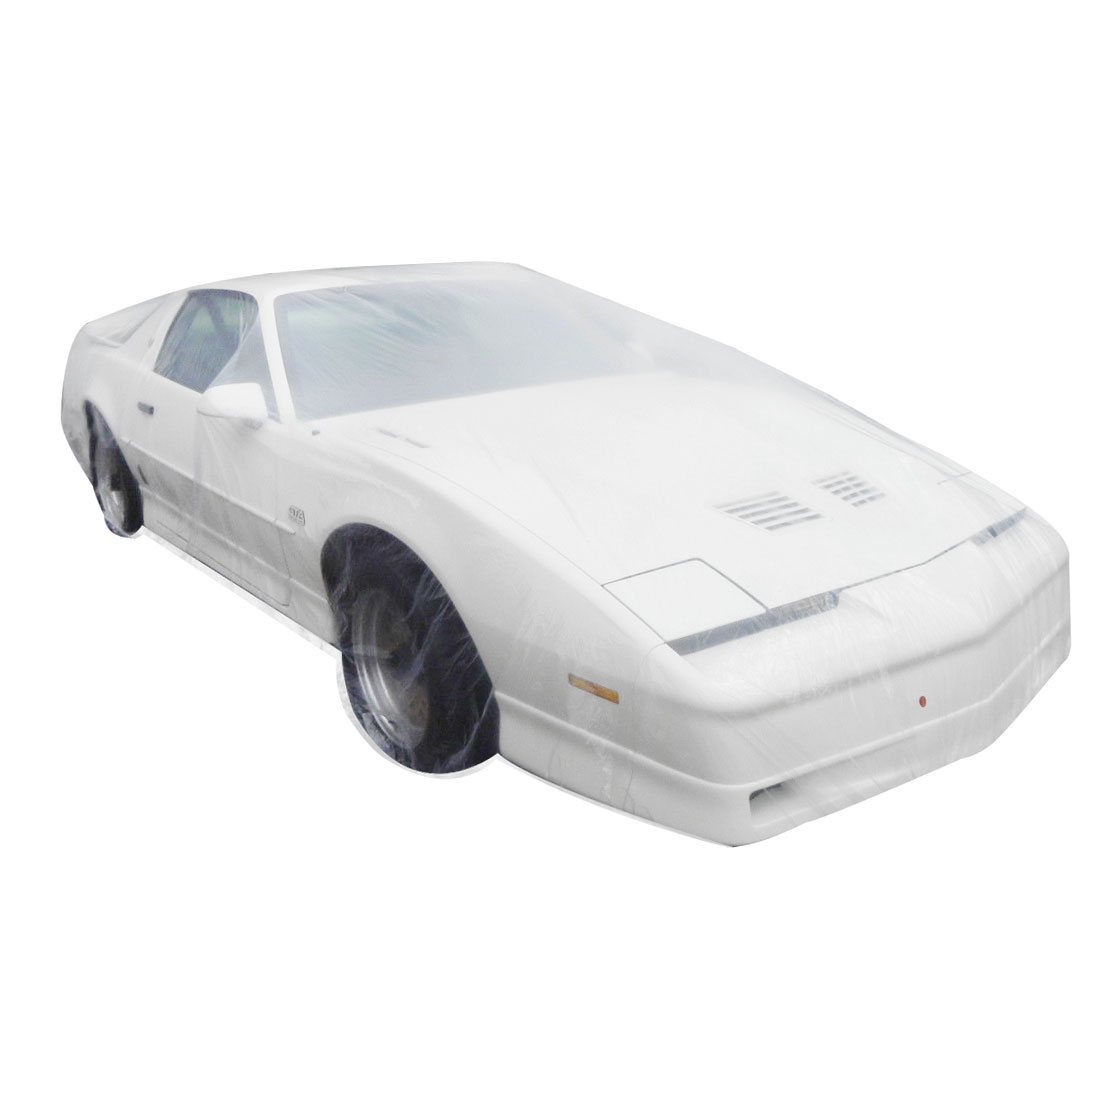 Clear Plastic Temporary Universal Disposable Car Cover Rain Dust Garage L